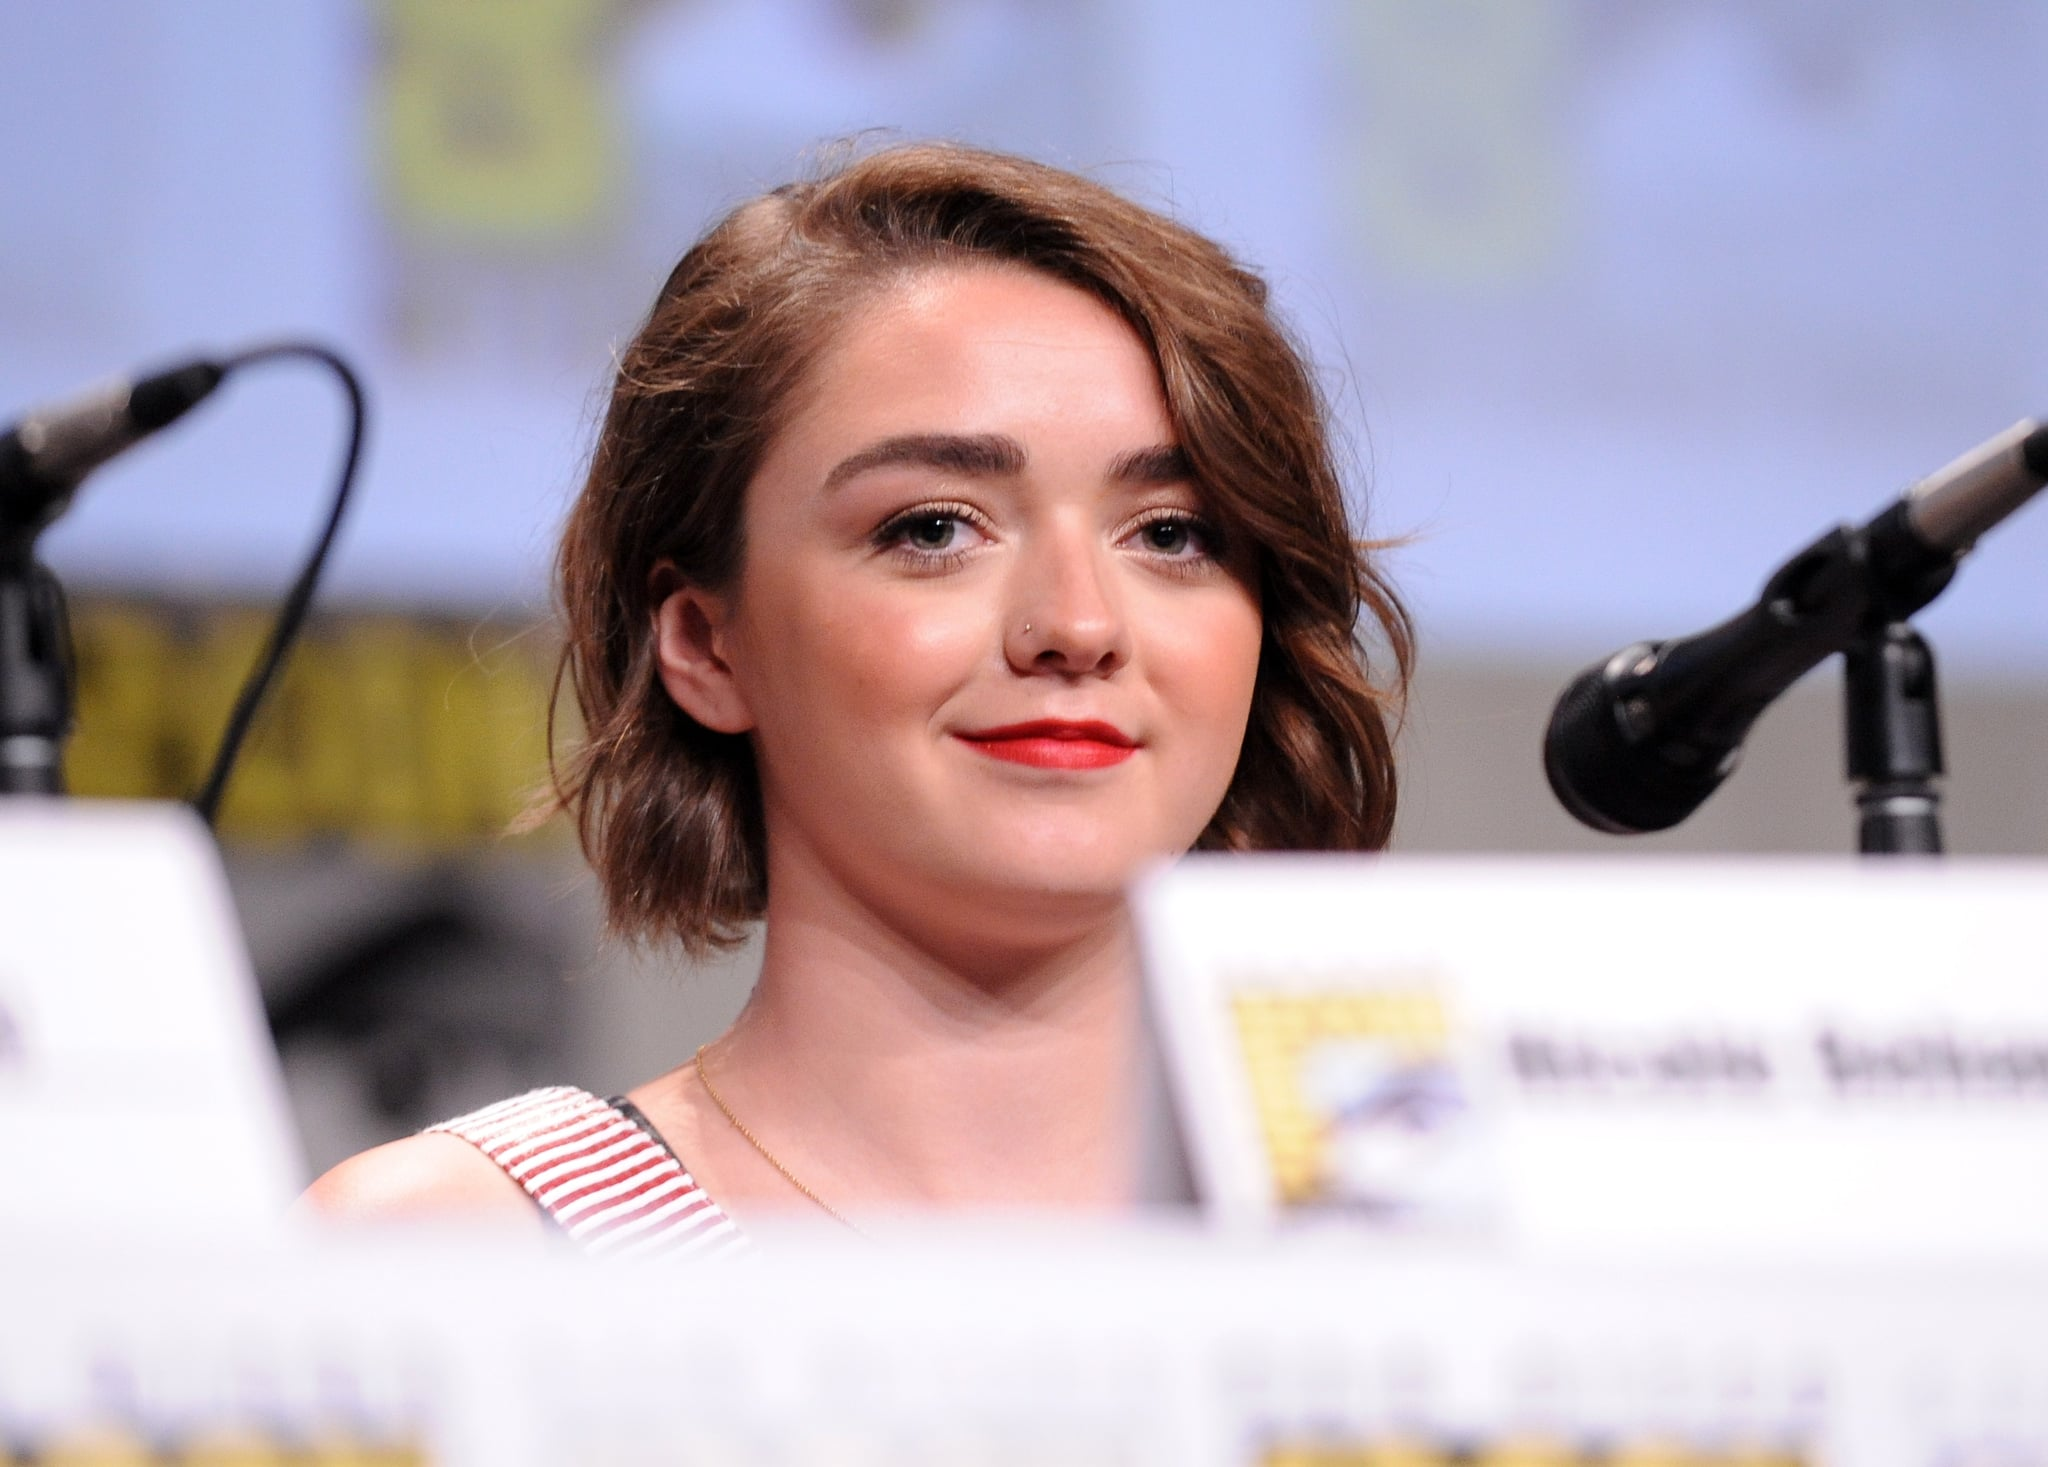 Maisie Williams, Arya of Game of Thrones